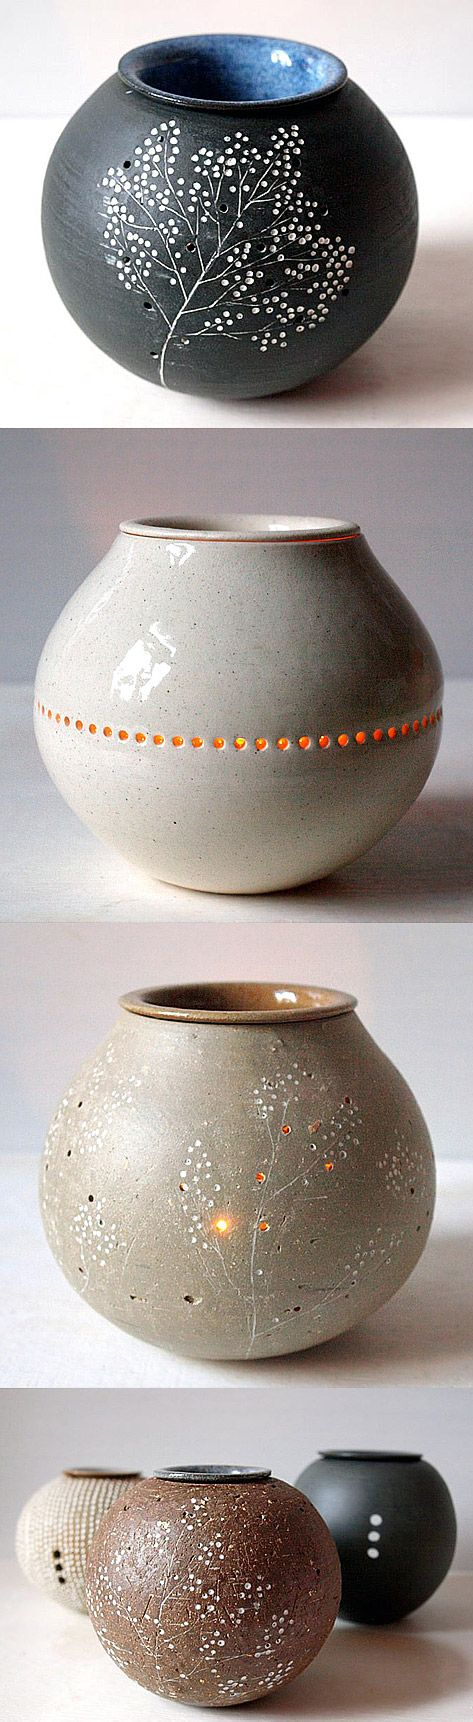 Keramické aroma lampy od Ema Mamisu https://www.facebook.com/media/set/?set=a.412306722228330.1073741842.367724166686586&type=1